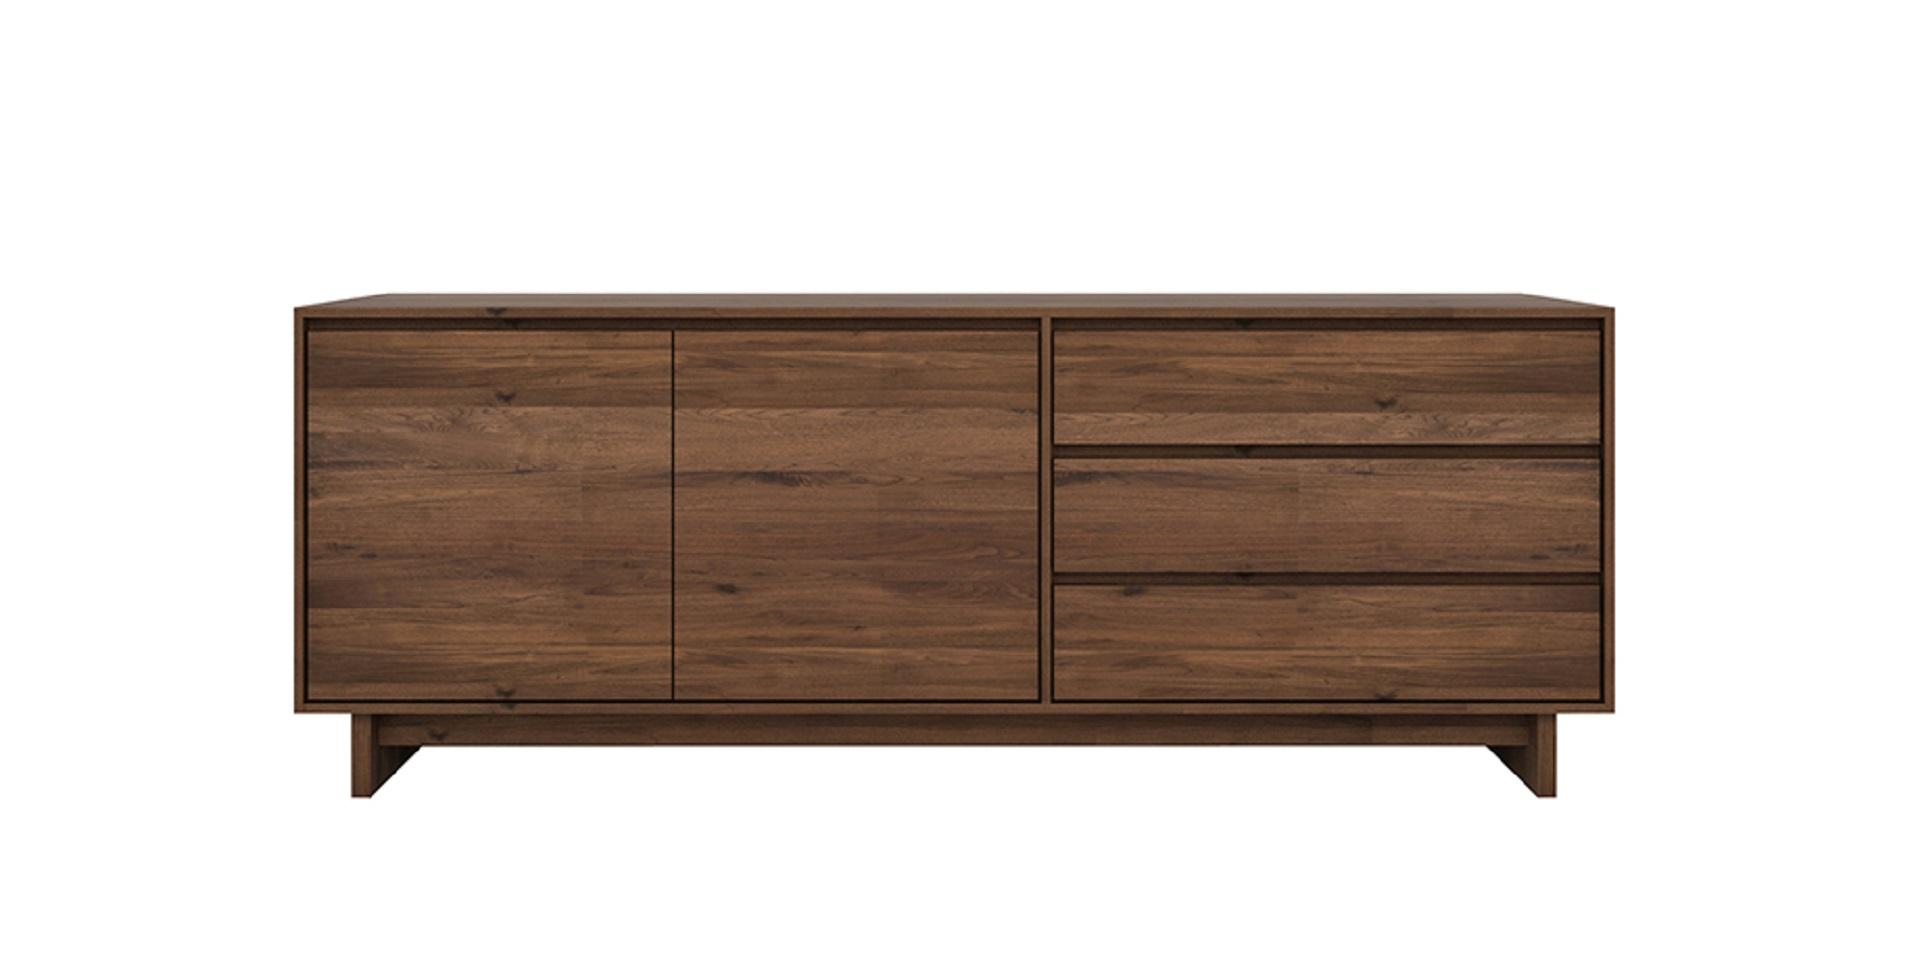 Ethnicraft Walnut Furniture